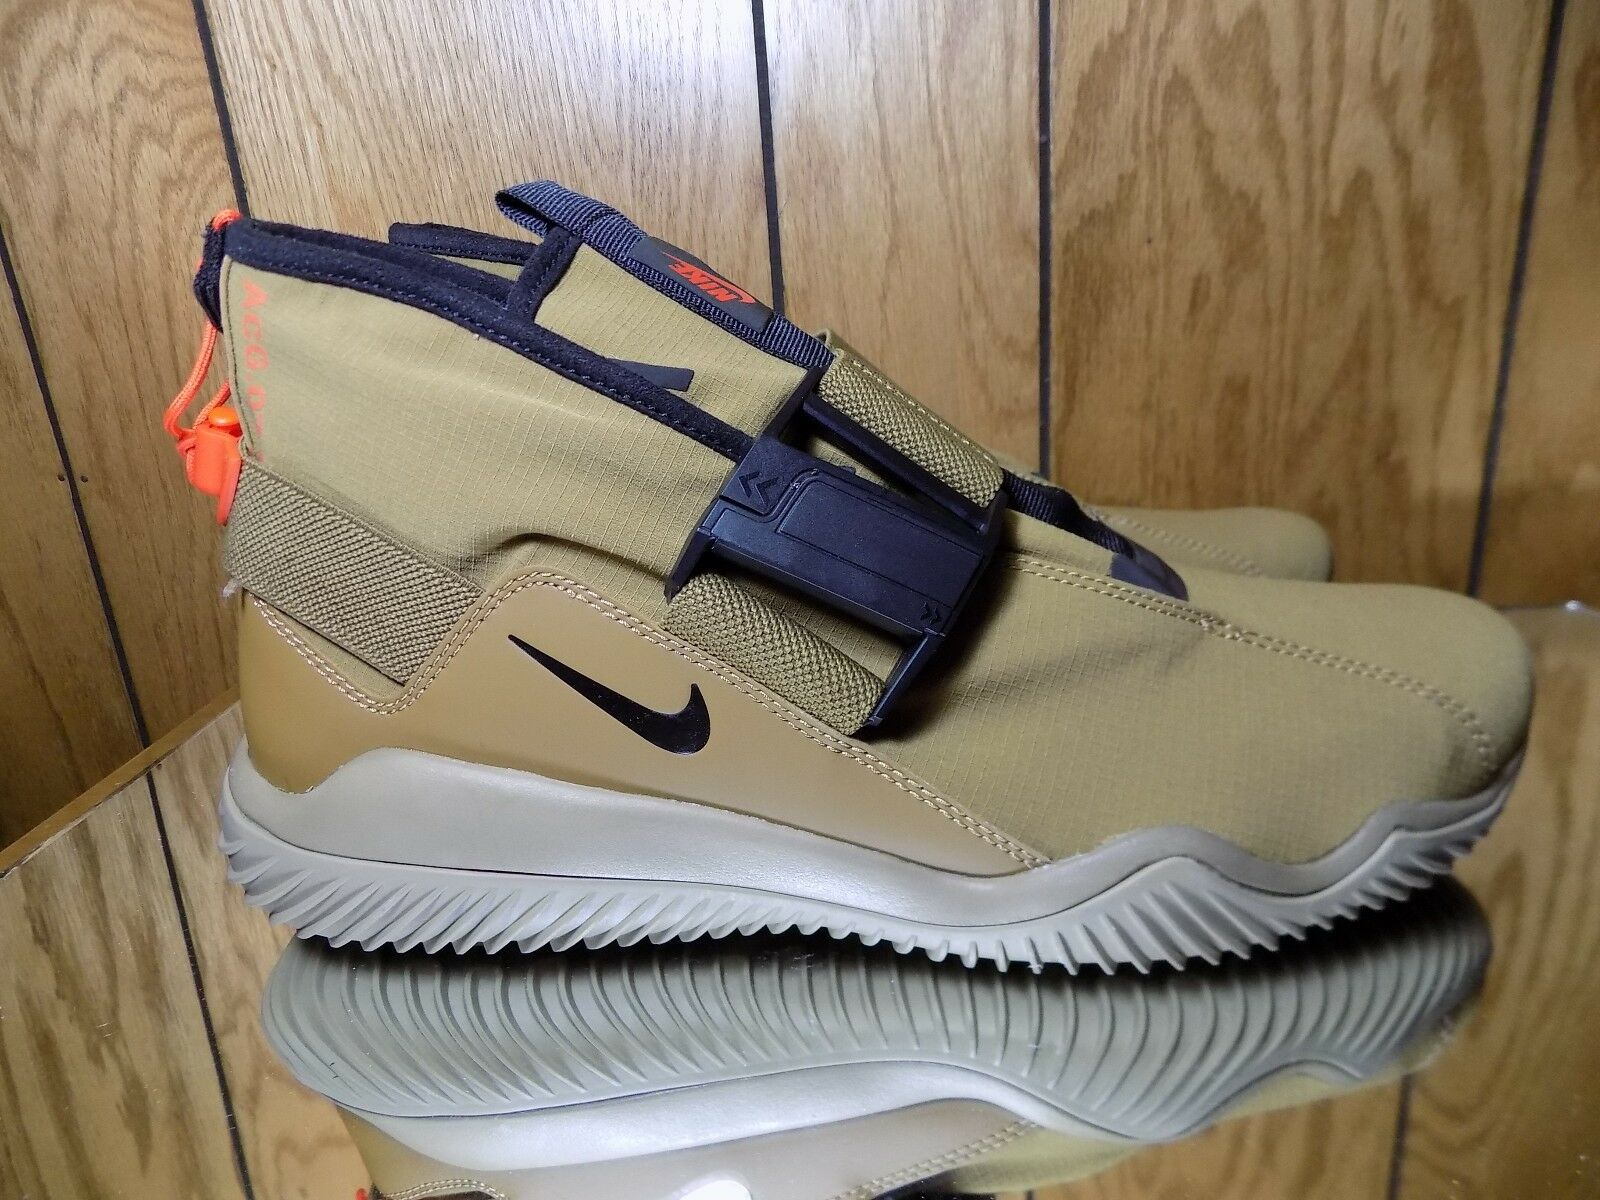 Nike ACG 07 KMTR Size Golden Beige Black Khaki 902776-201 Size KMTR 13 62c457